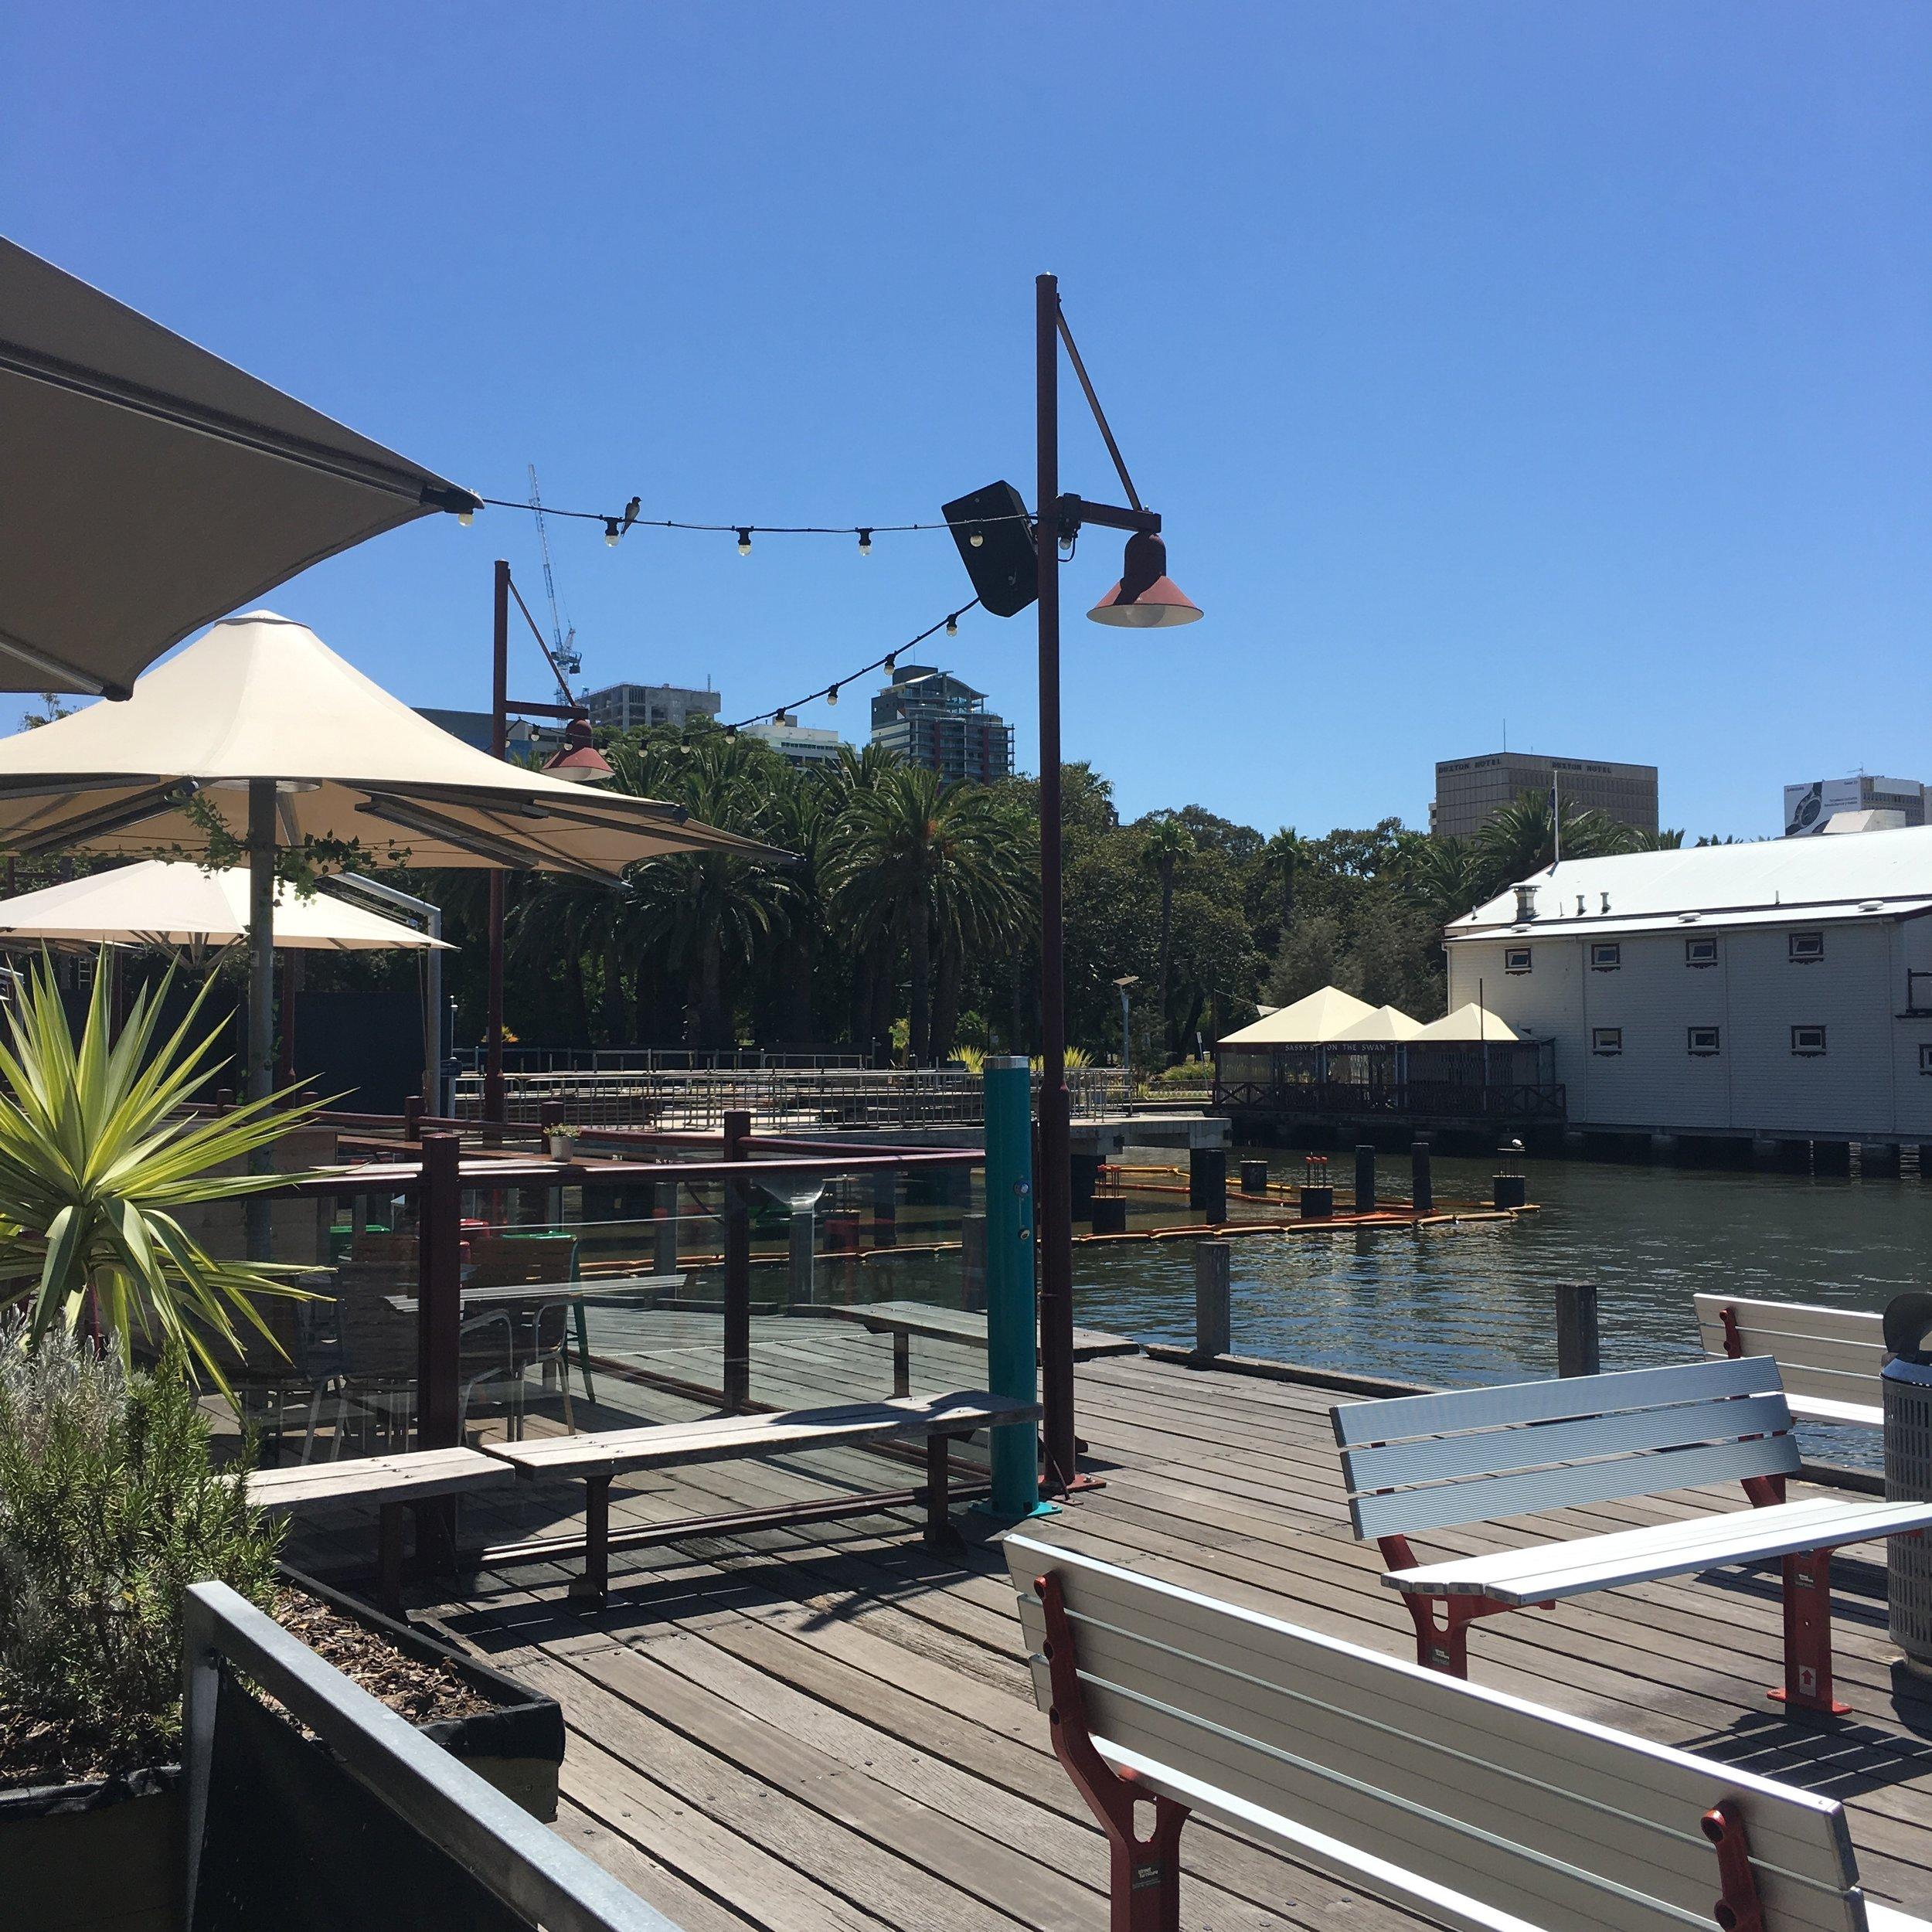 Perth CBD (central business district)